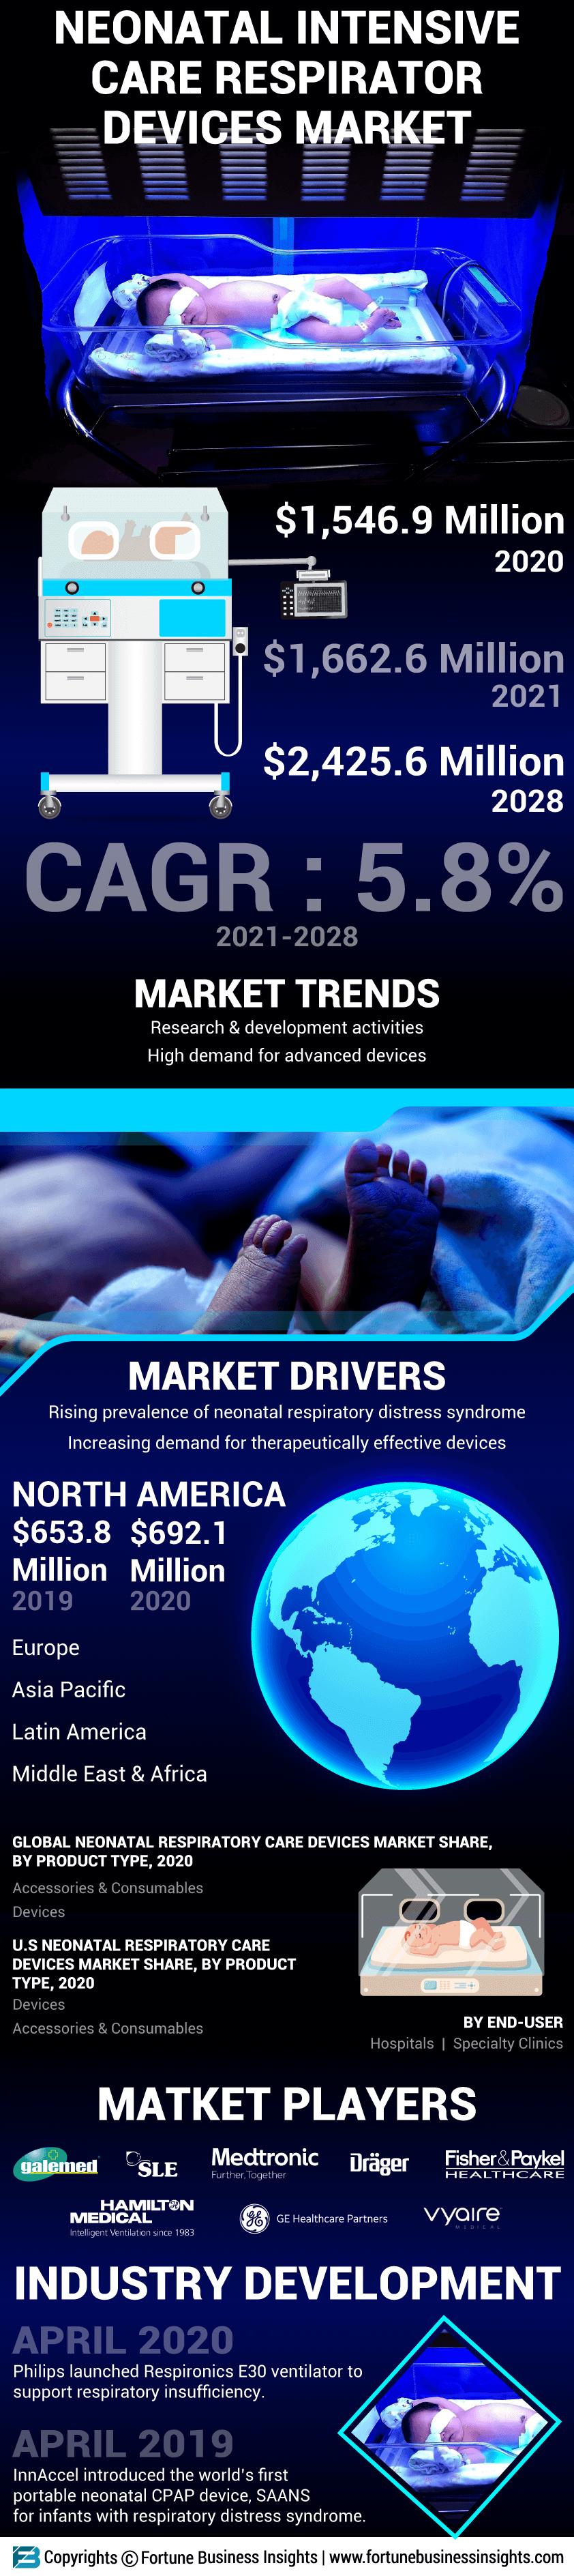 Neonatal Intensive Care Respiratory Devices Market